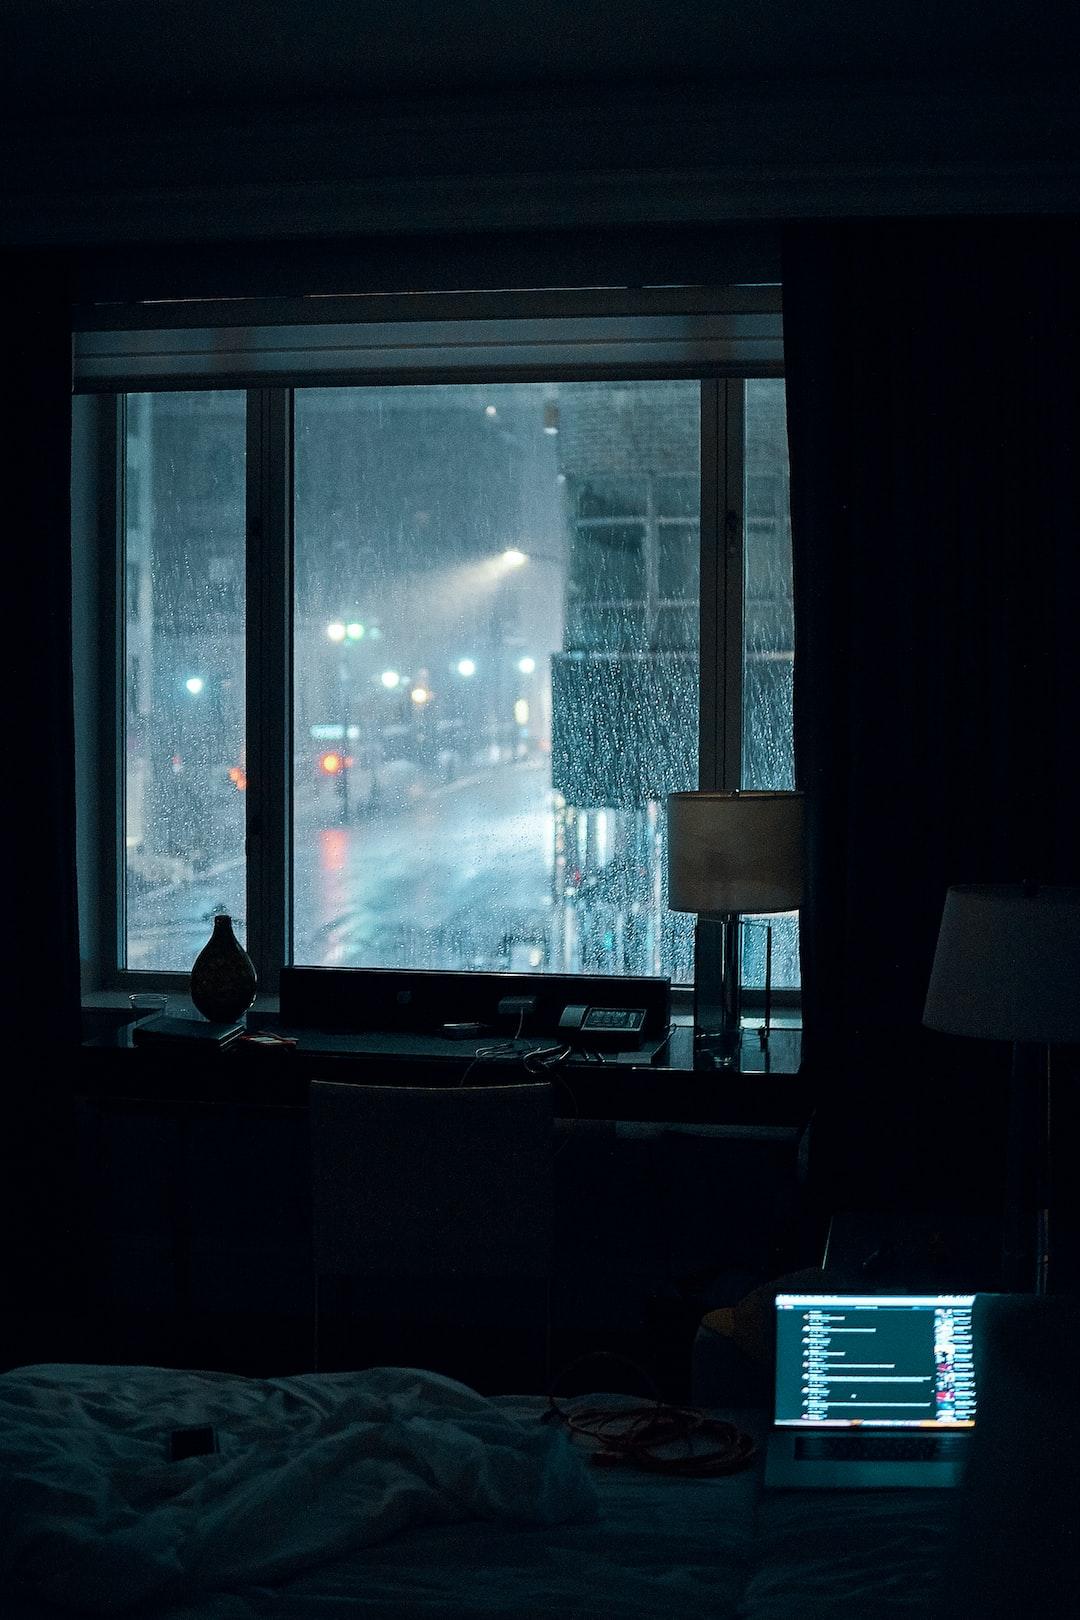 Rainy Nights in NYC